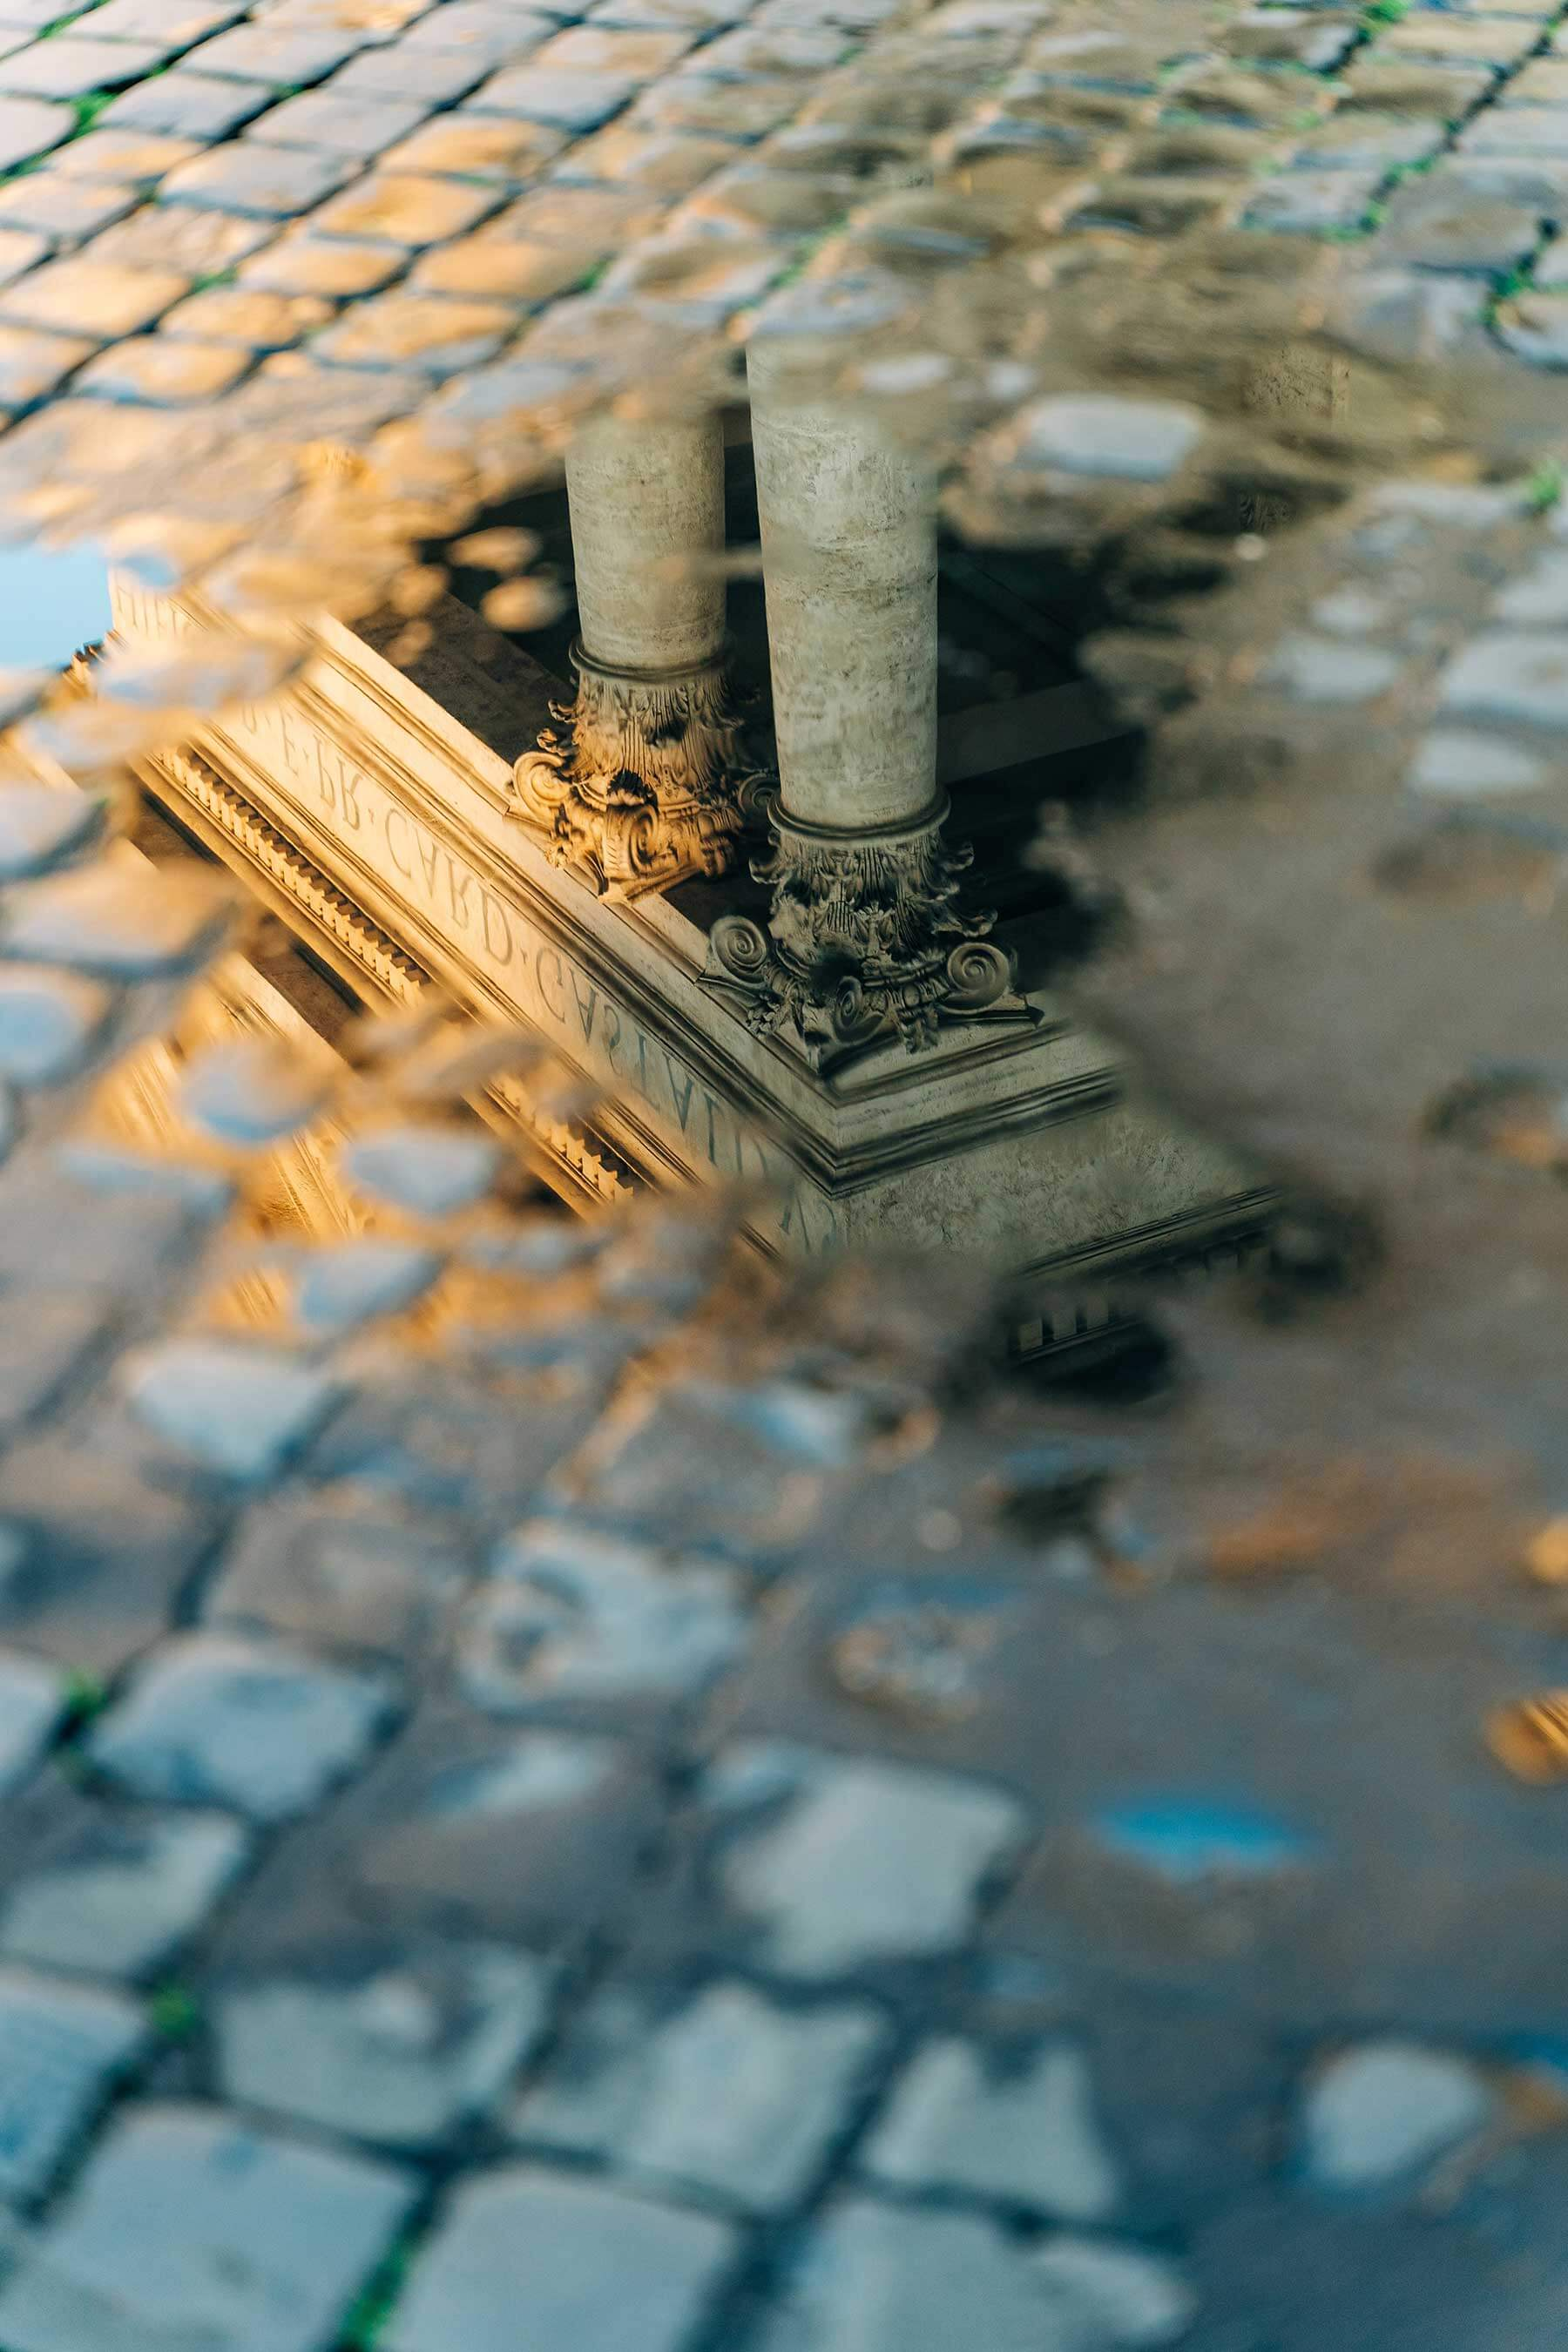 Bilderparade DCLII LangweileDich.net_Bilderparade_DCLII_42